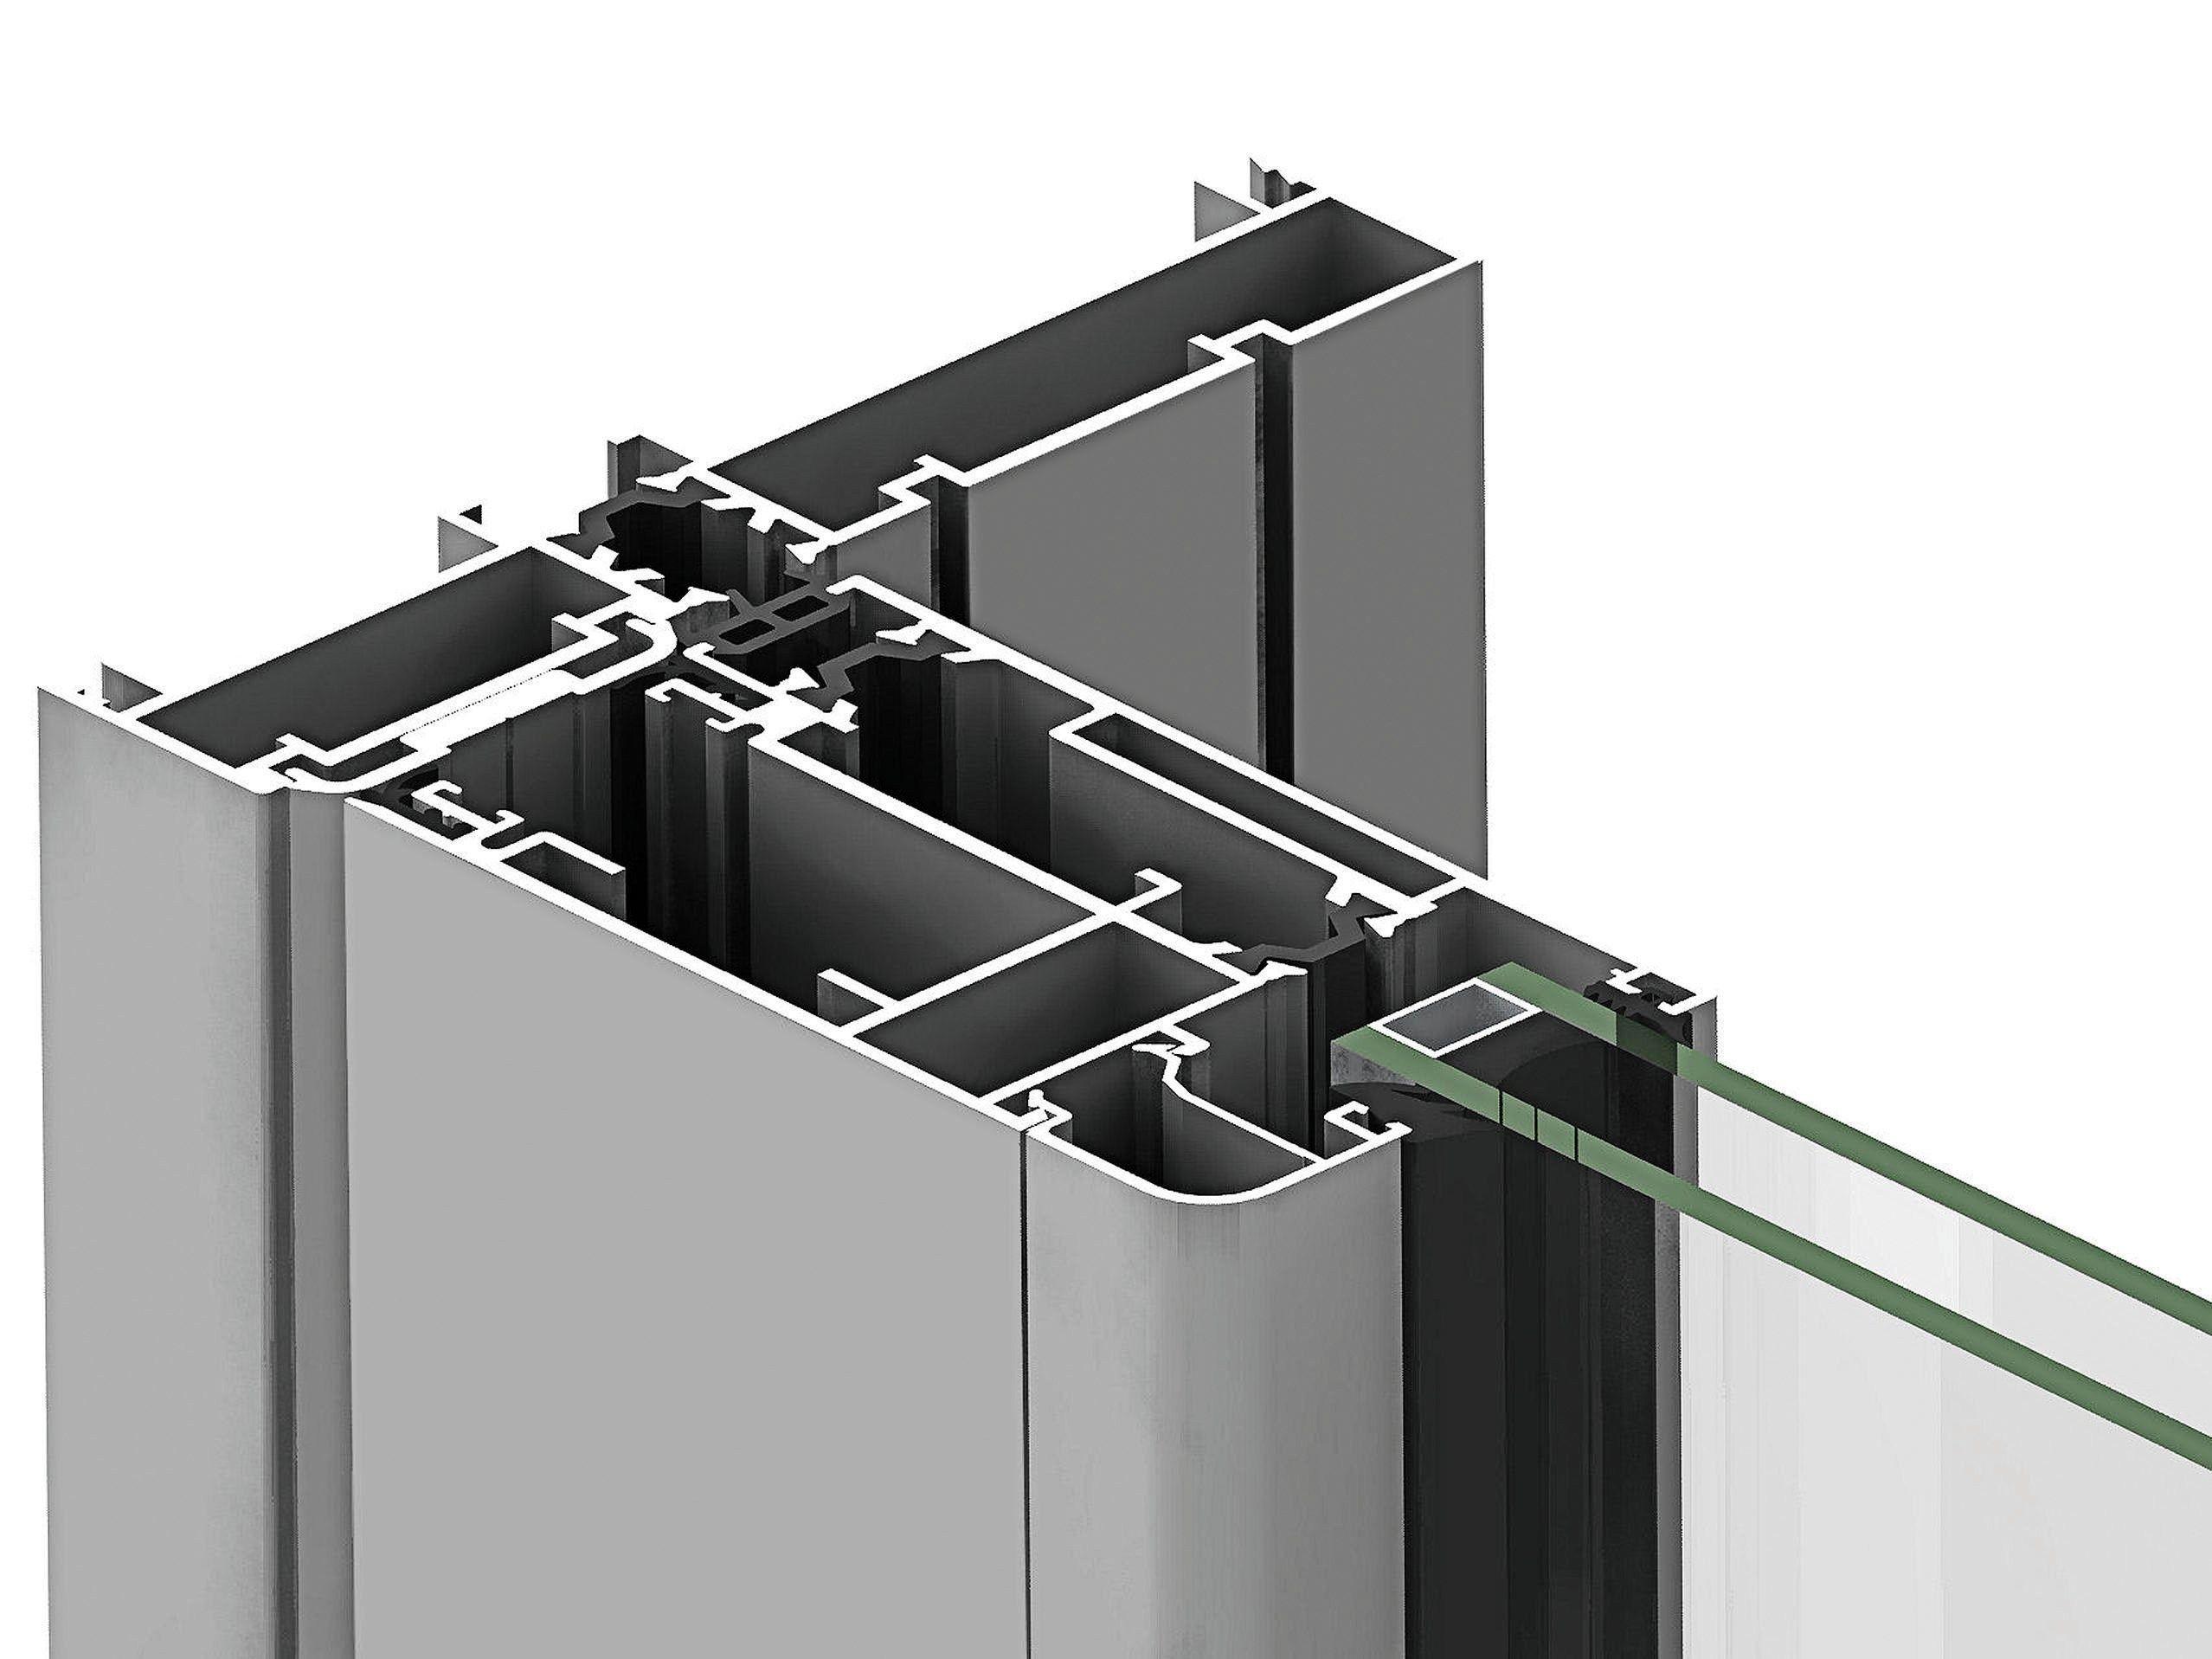 Aluminium thermal break window eku tt as by profilati for Thermal windows prices